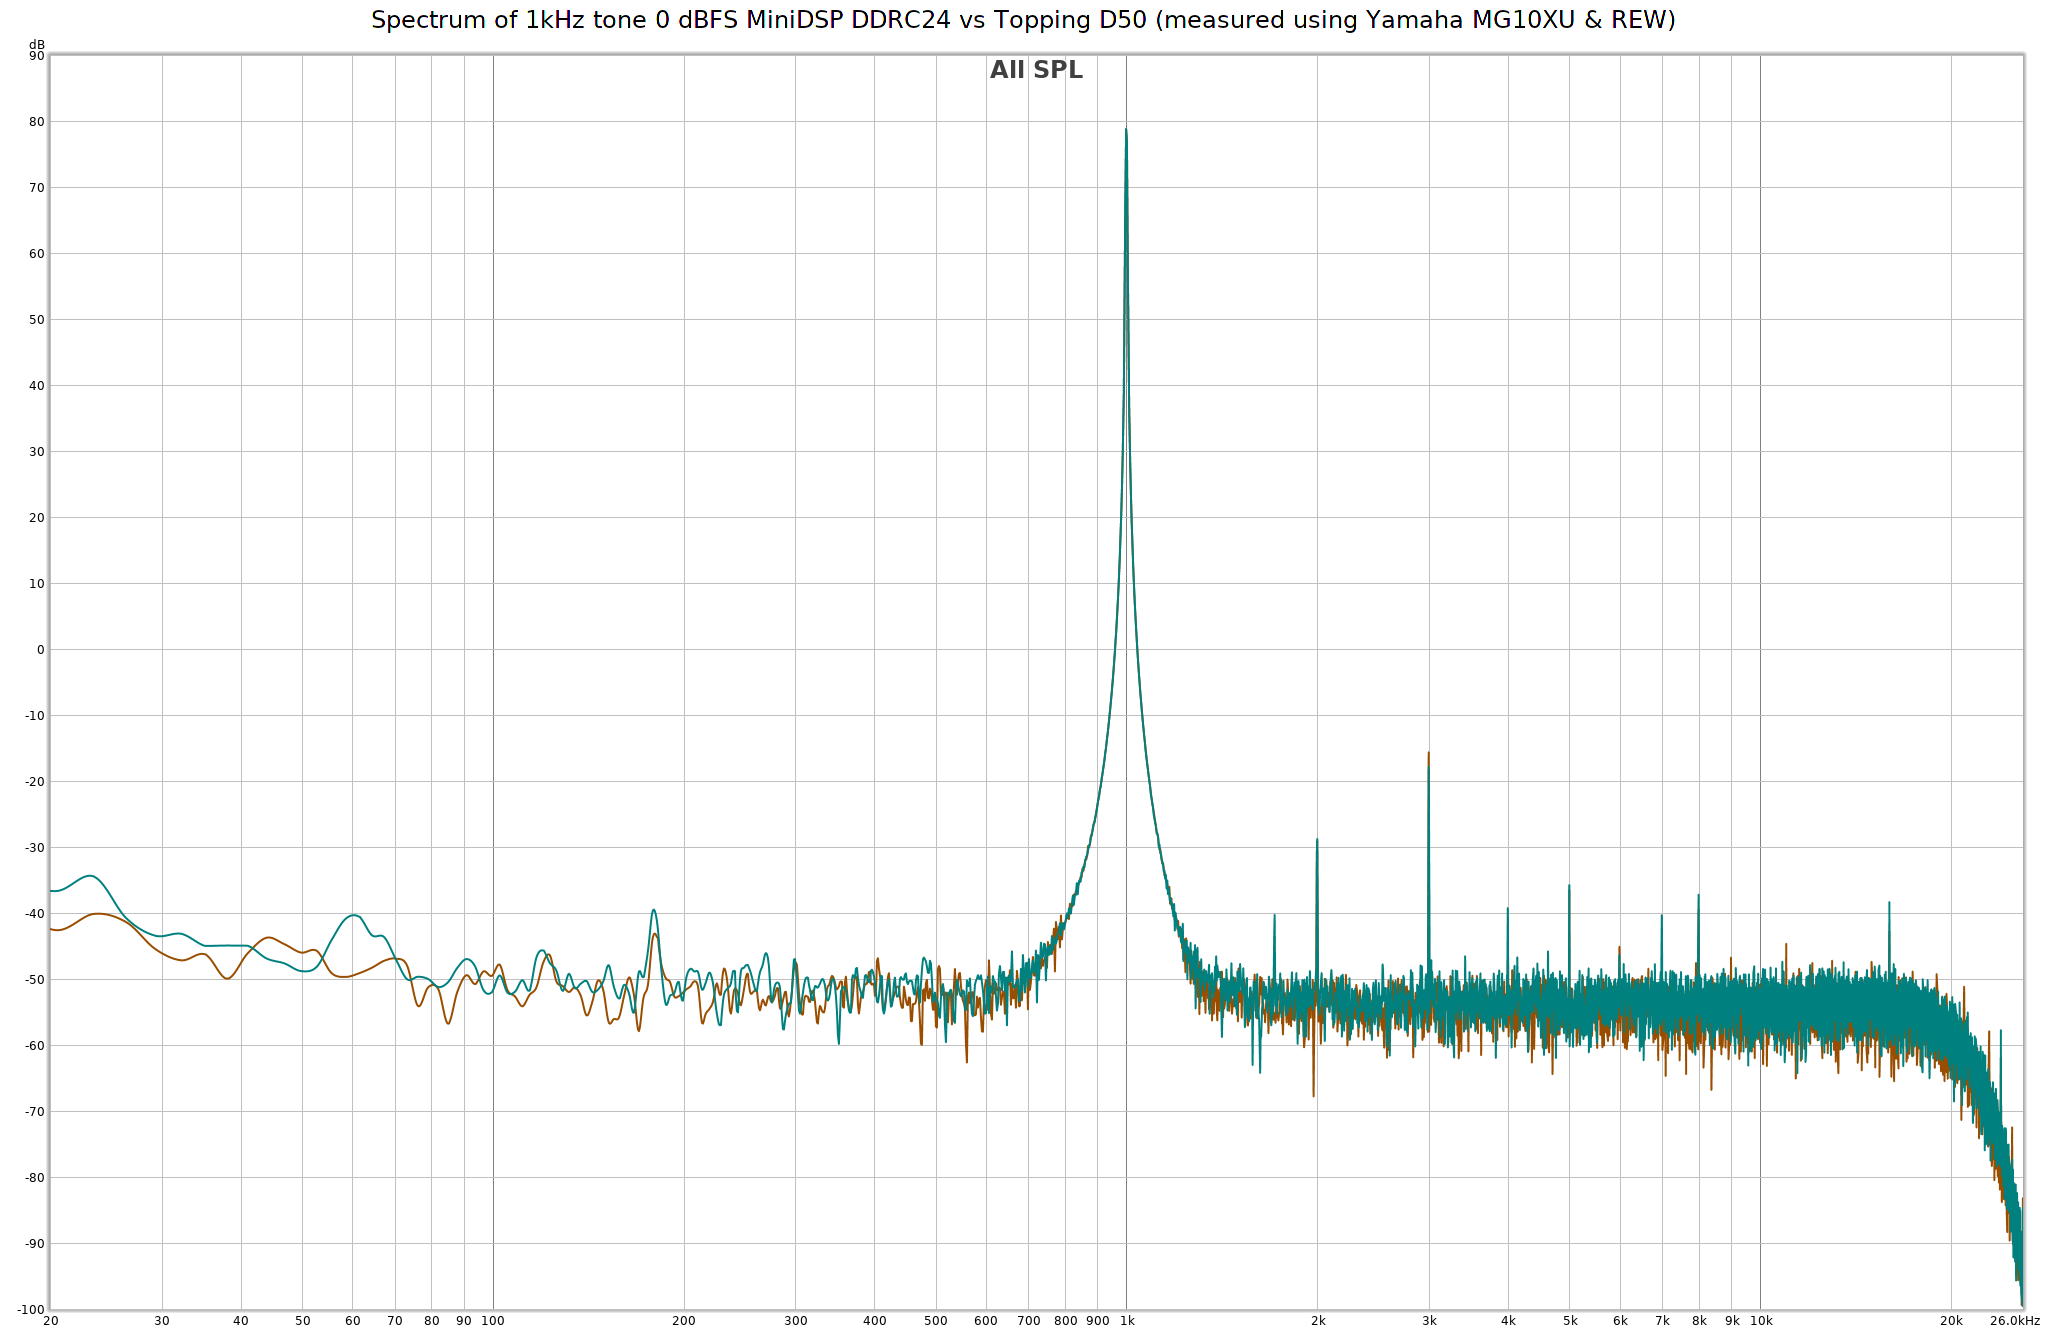 Spectrum of 1kHz tone 0 dBFS MiniDSP DDRC24 vs Topping D50 (measured using Yamaha MG10XU & REW).png